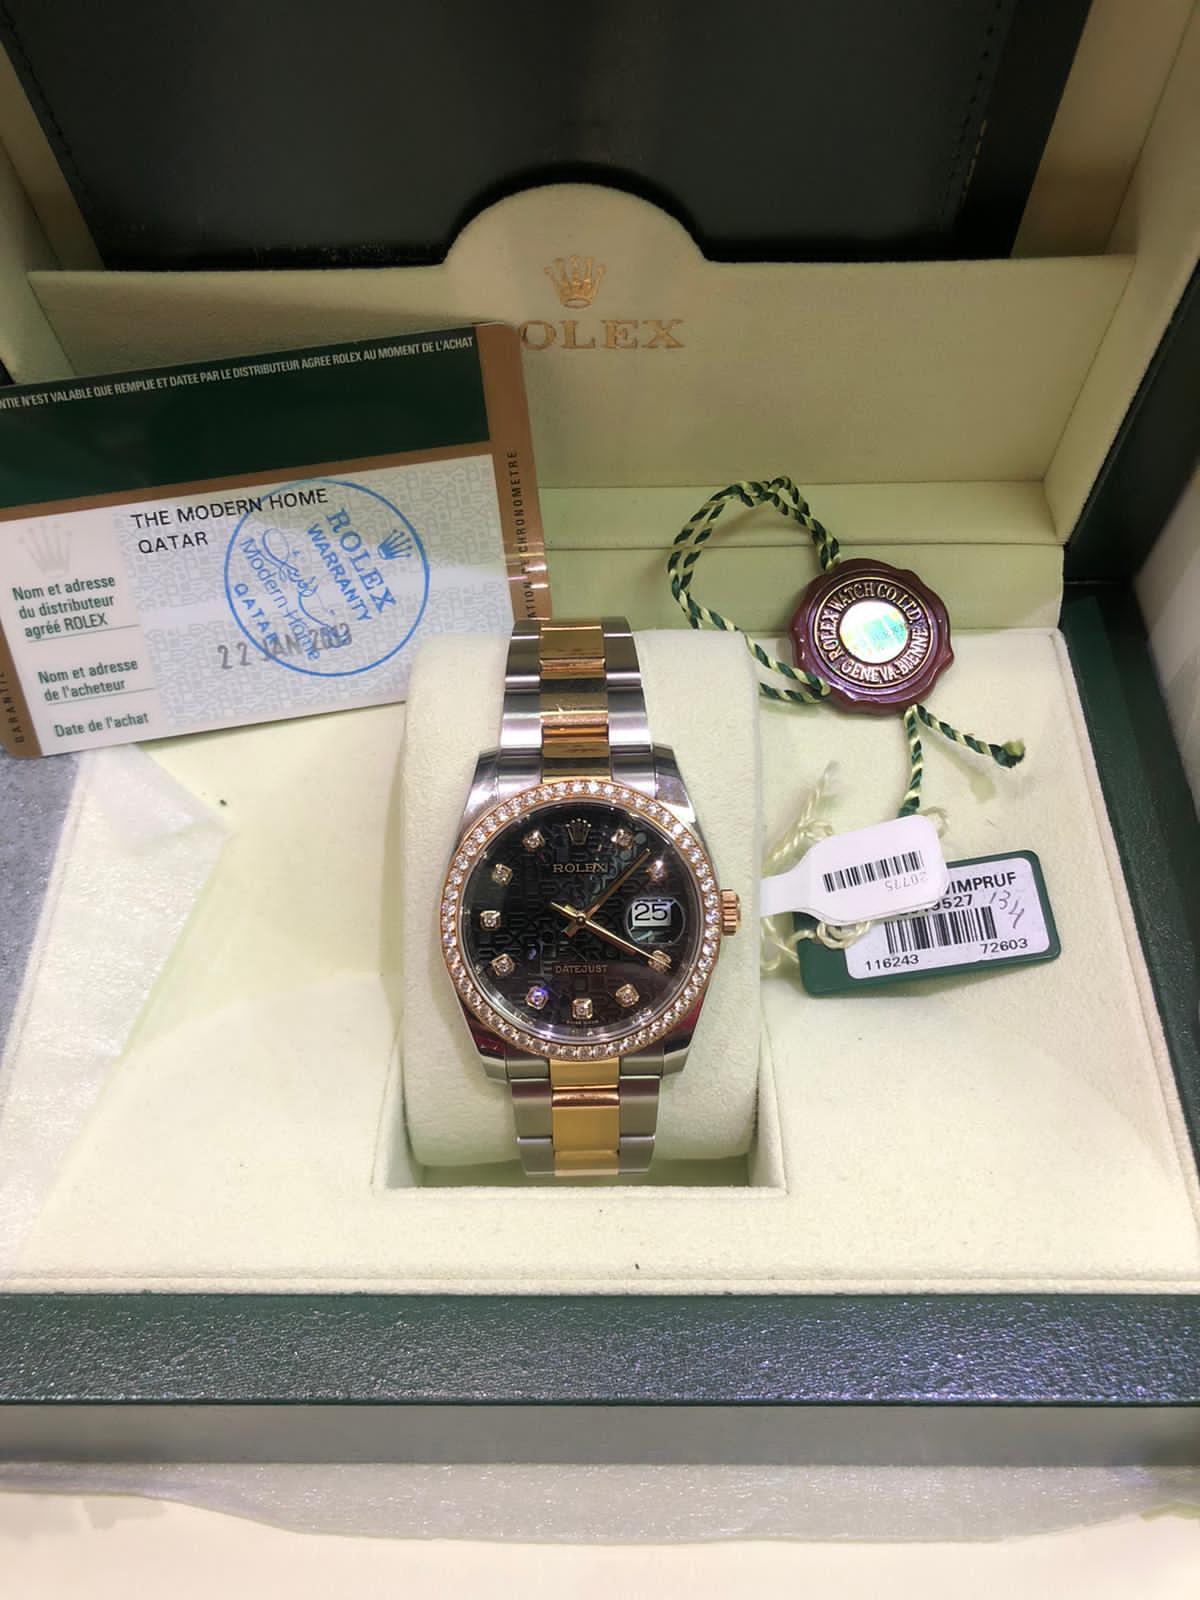 Rolex men's watch for sale